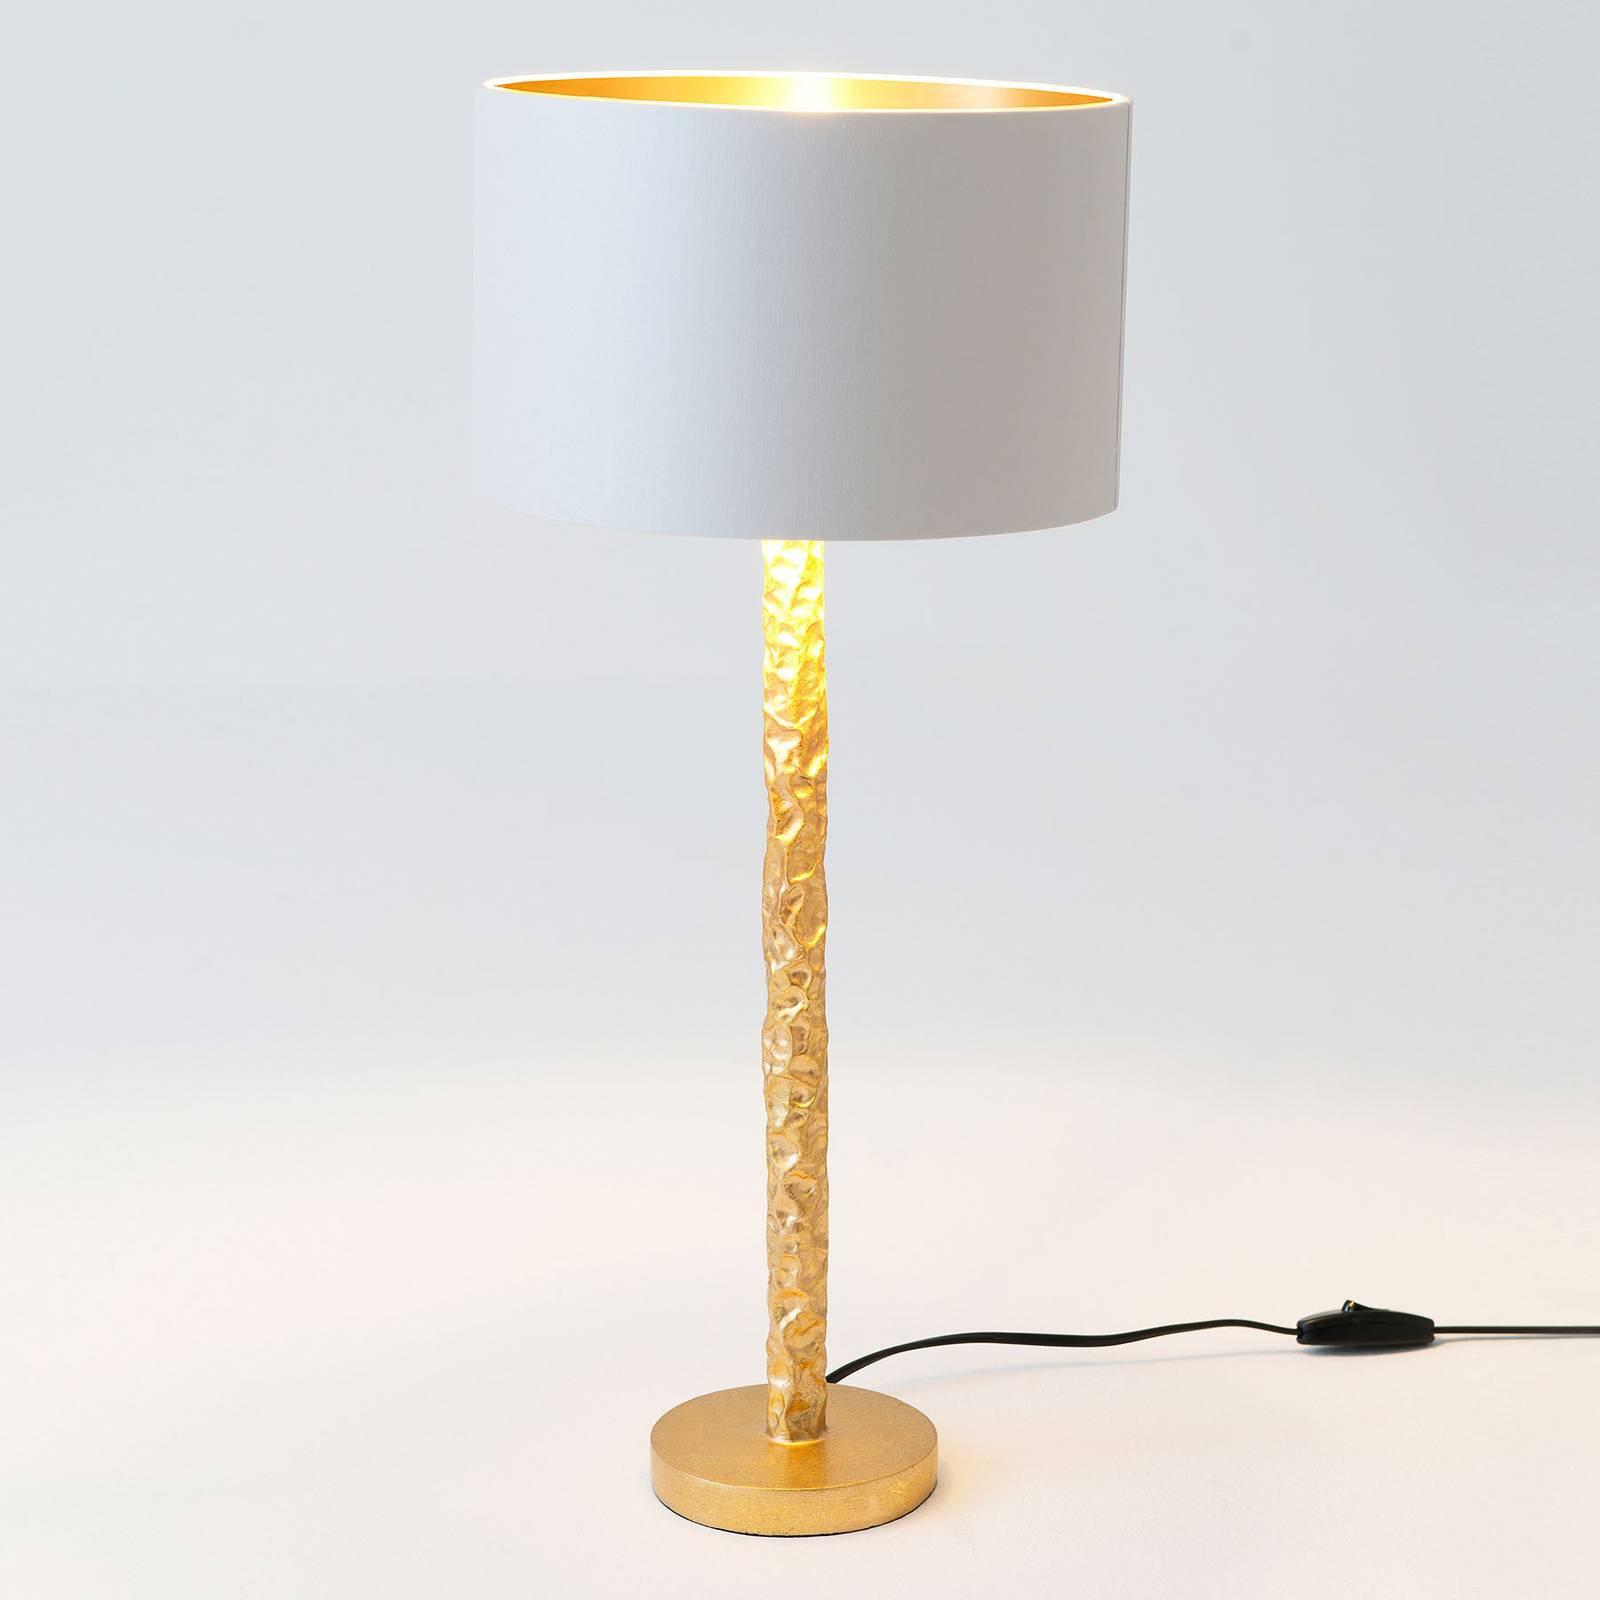 Bordlampe Cancelliere Rotonda, hvit/gull, 57 cm